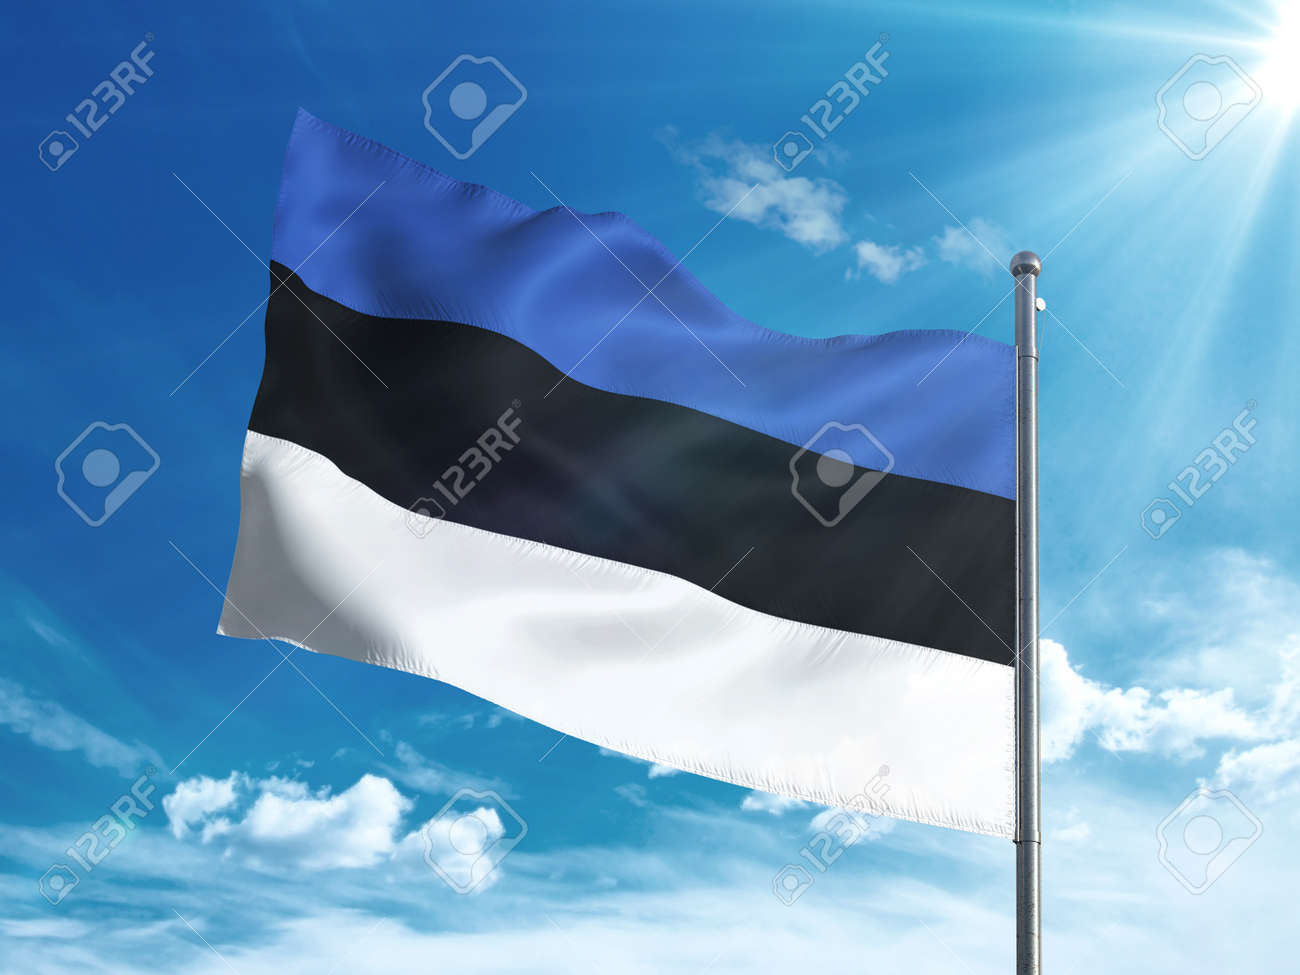 Estonia flag waving in the blue sky - 82914170